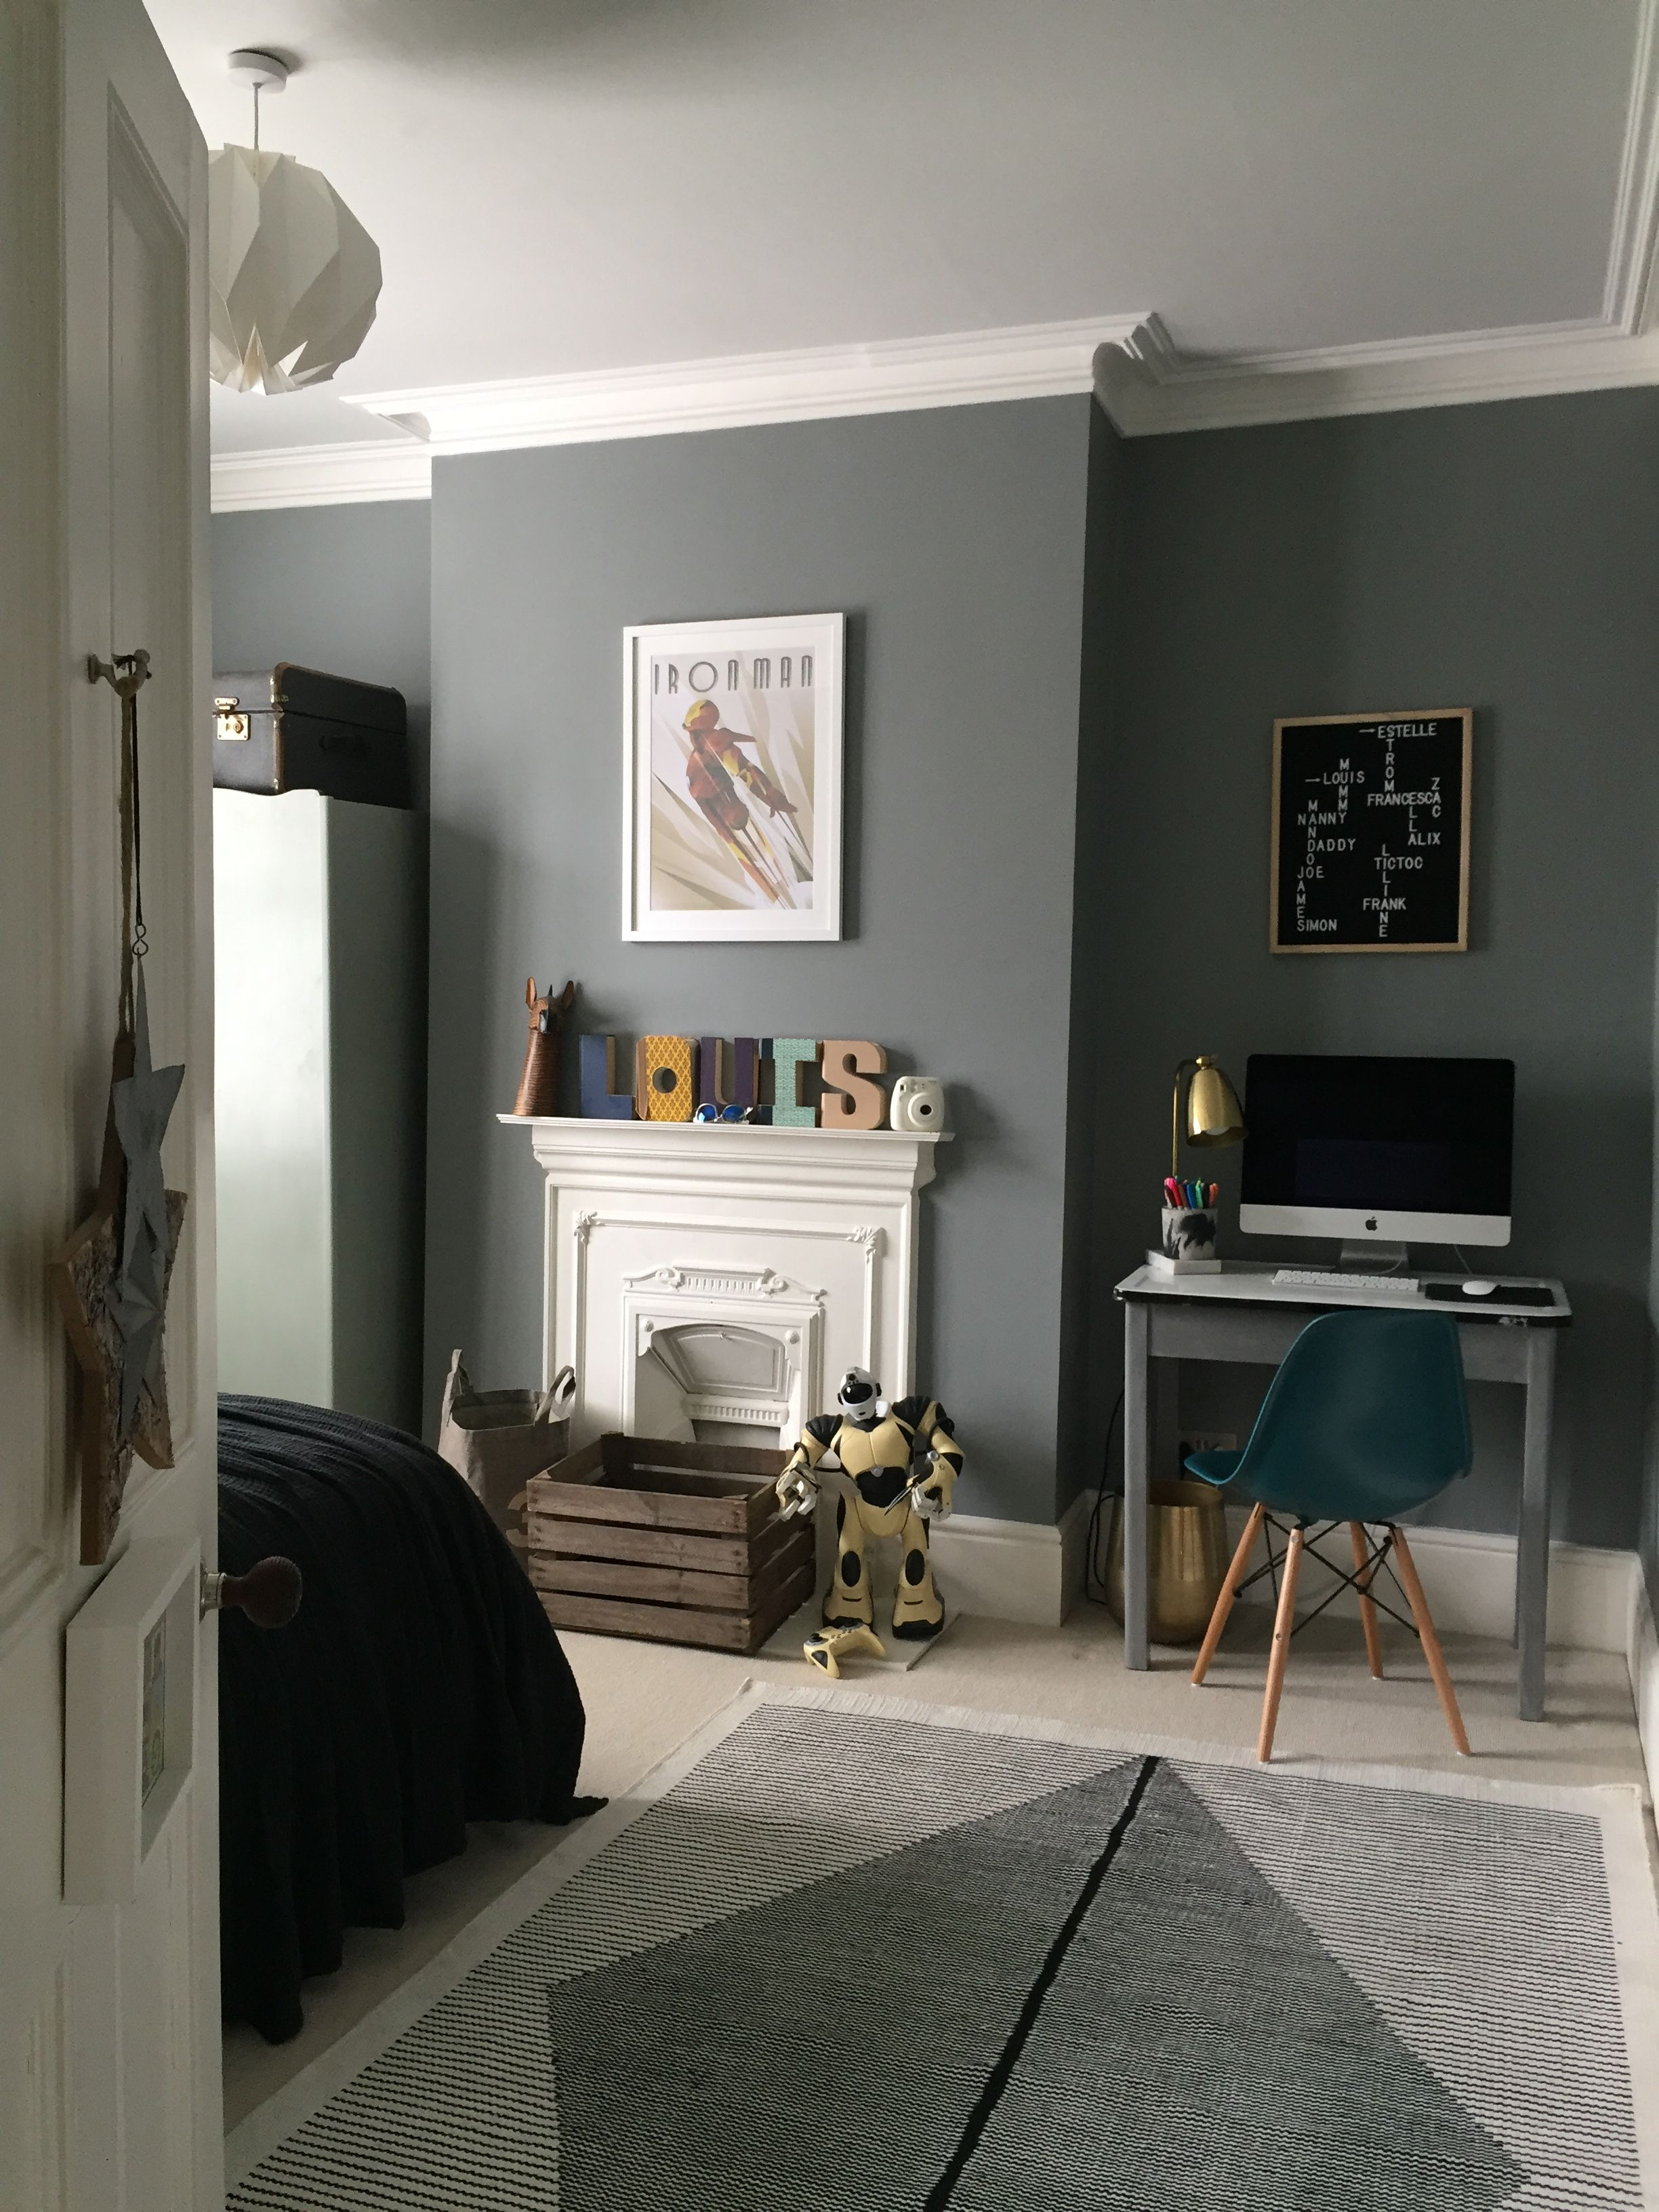 Little Greene Paint - Grey teal #226; preteen boy bedroom